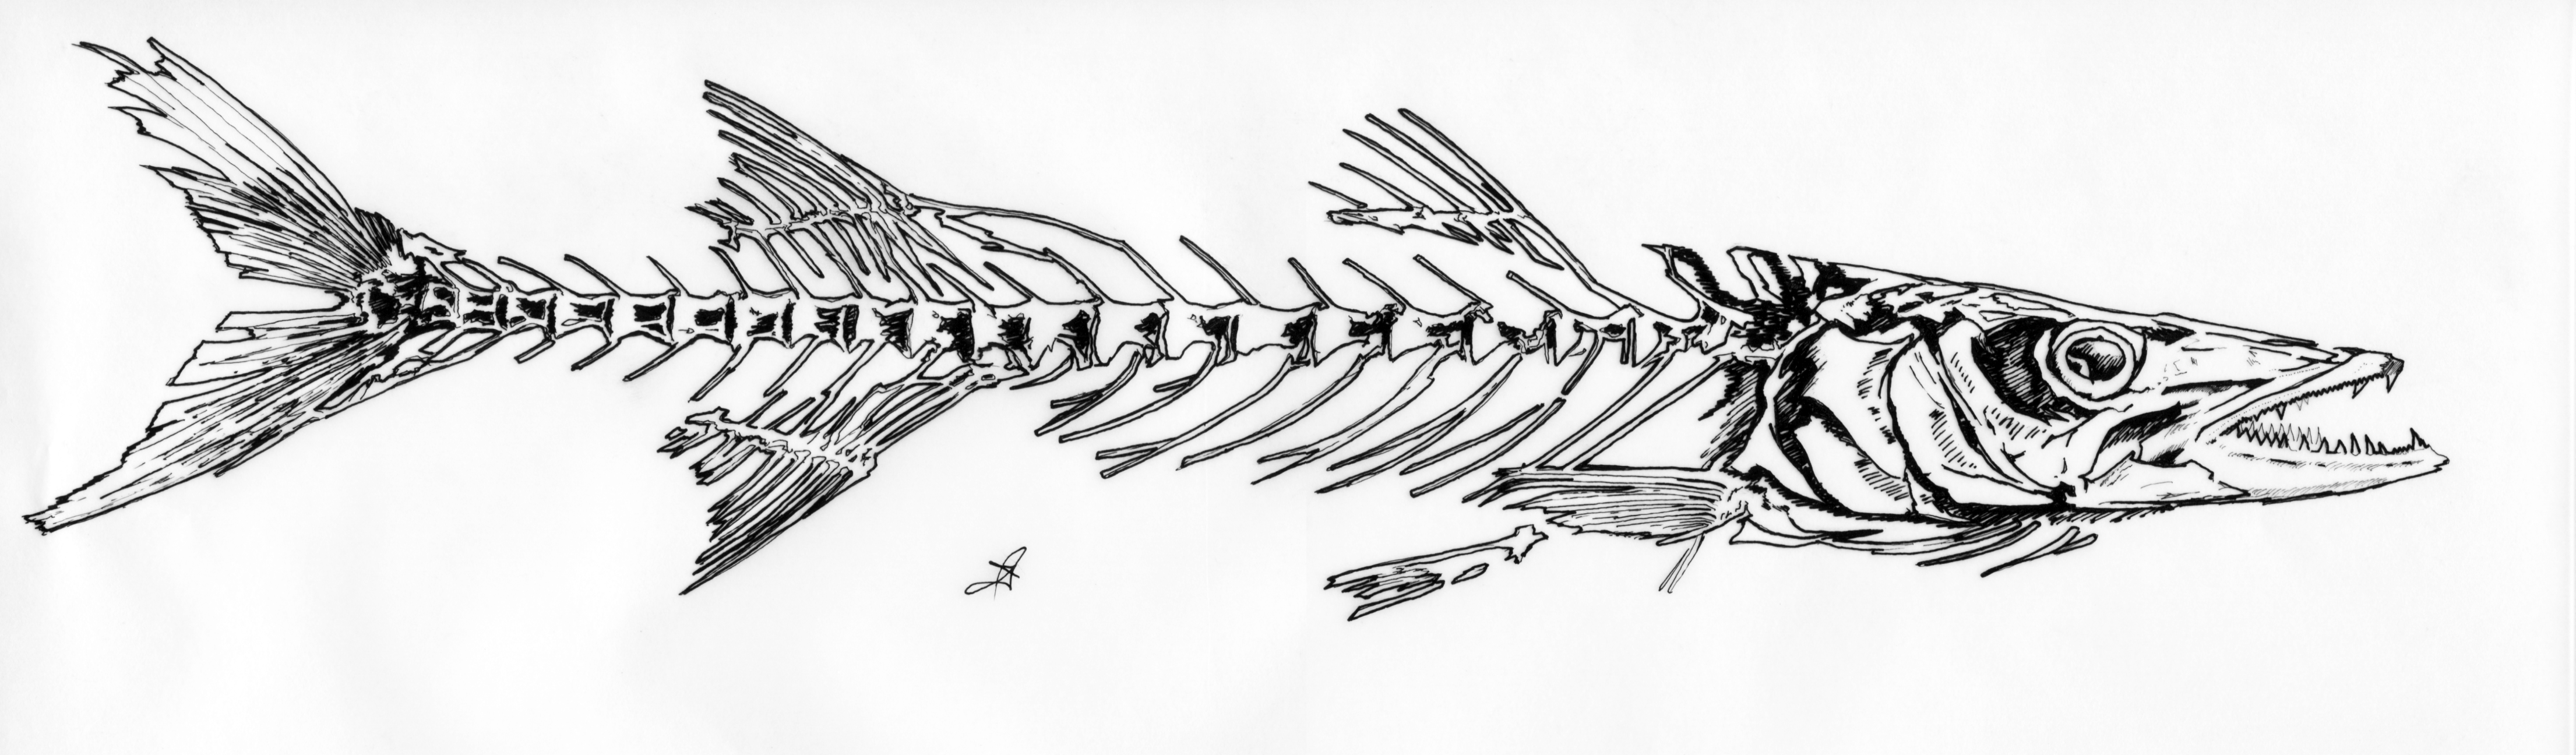 how to draw cartoon fish bones